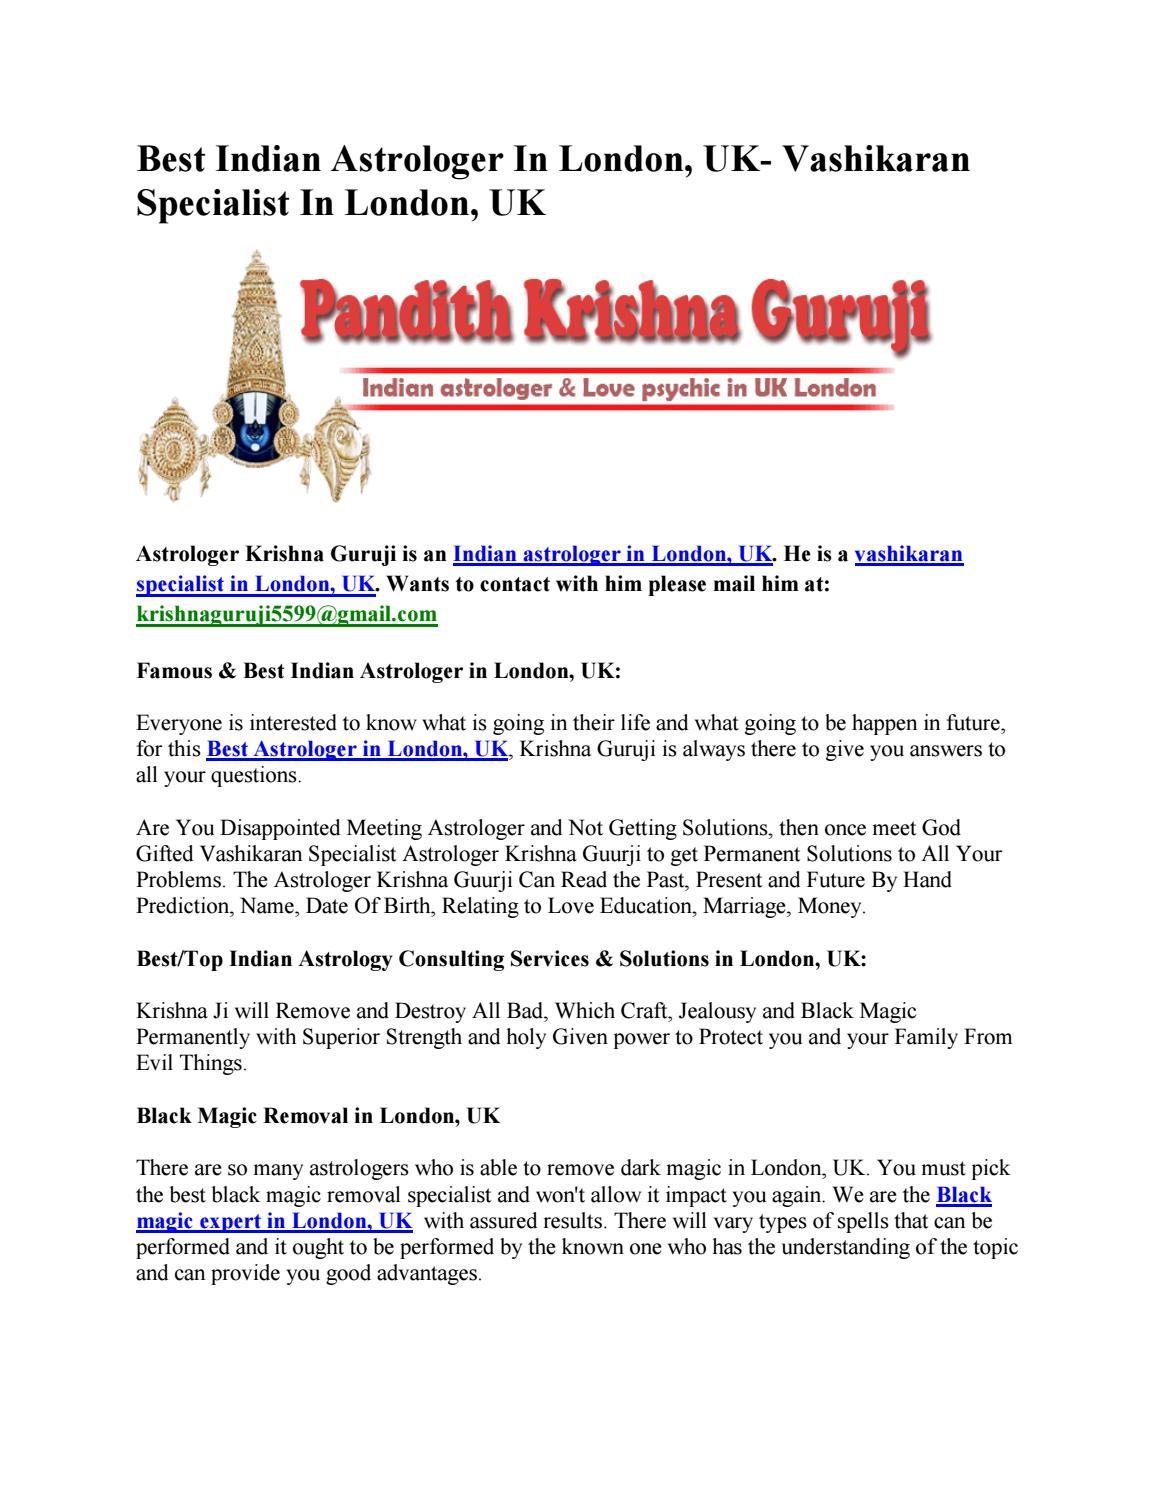 astrologi dating site uk mobile datingwebsites